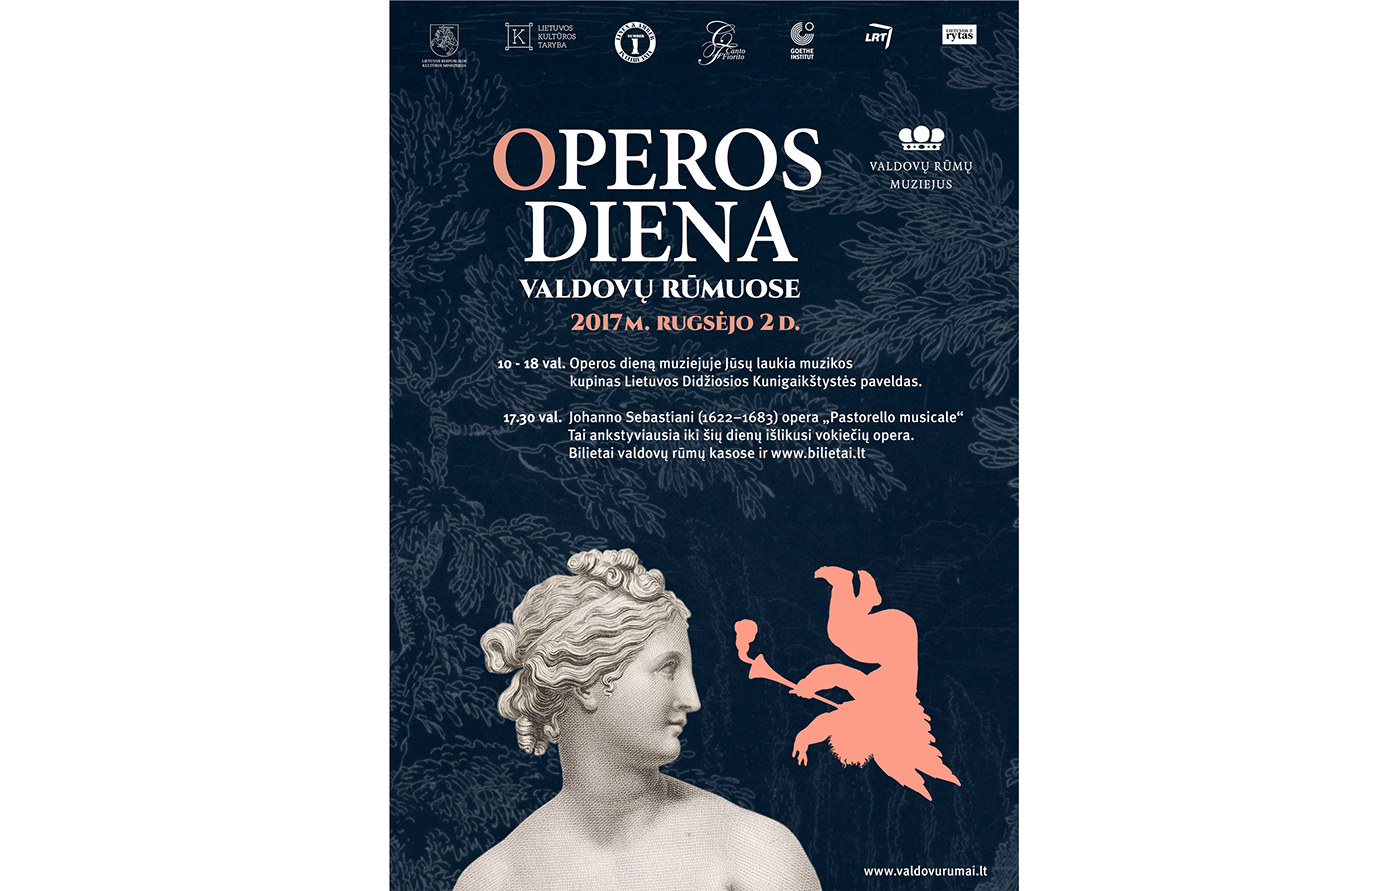 poster graphic design  typography   public domain venus Digital Art  angel vilnius collage